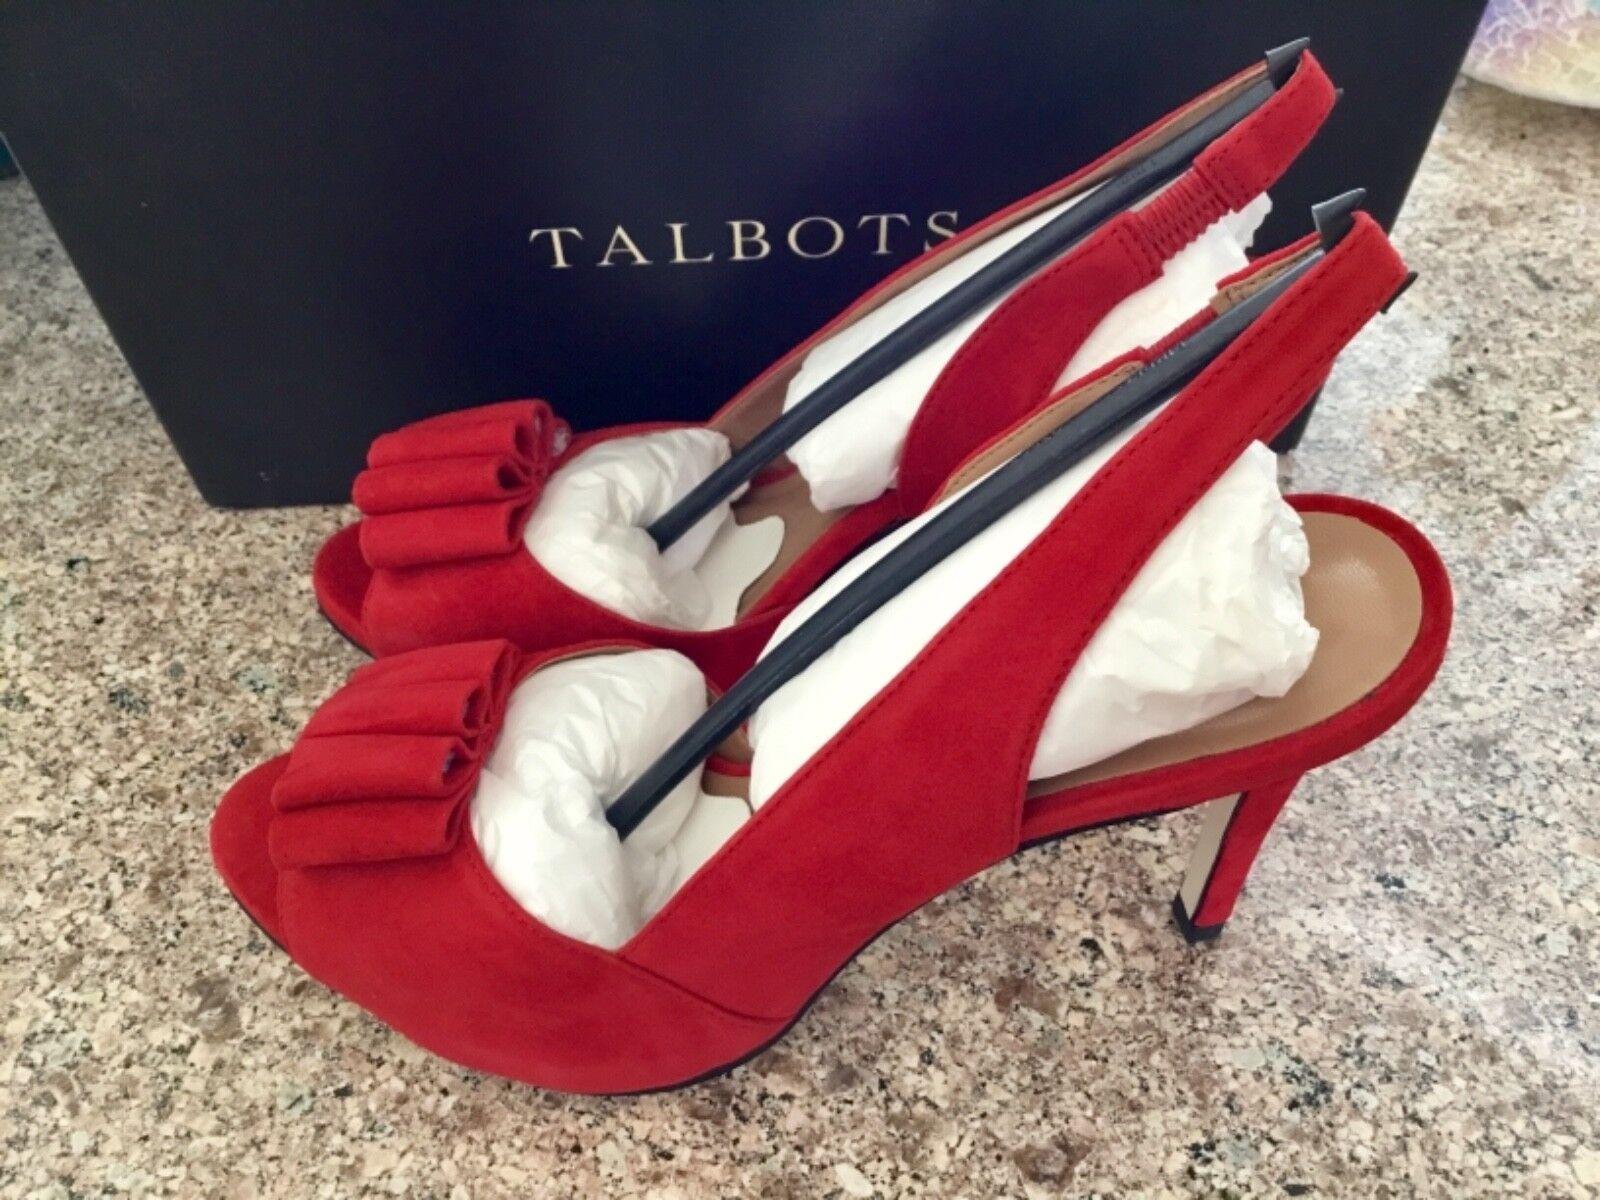 NEW Talbots 4 Vanesa Slingback ROT Suede 4 Talbots inch Heels Größe 8 M NIB 2a4903